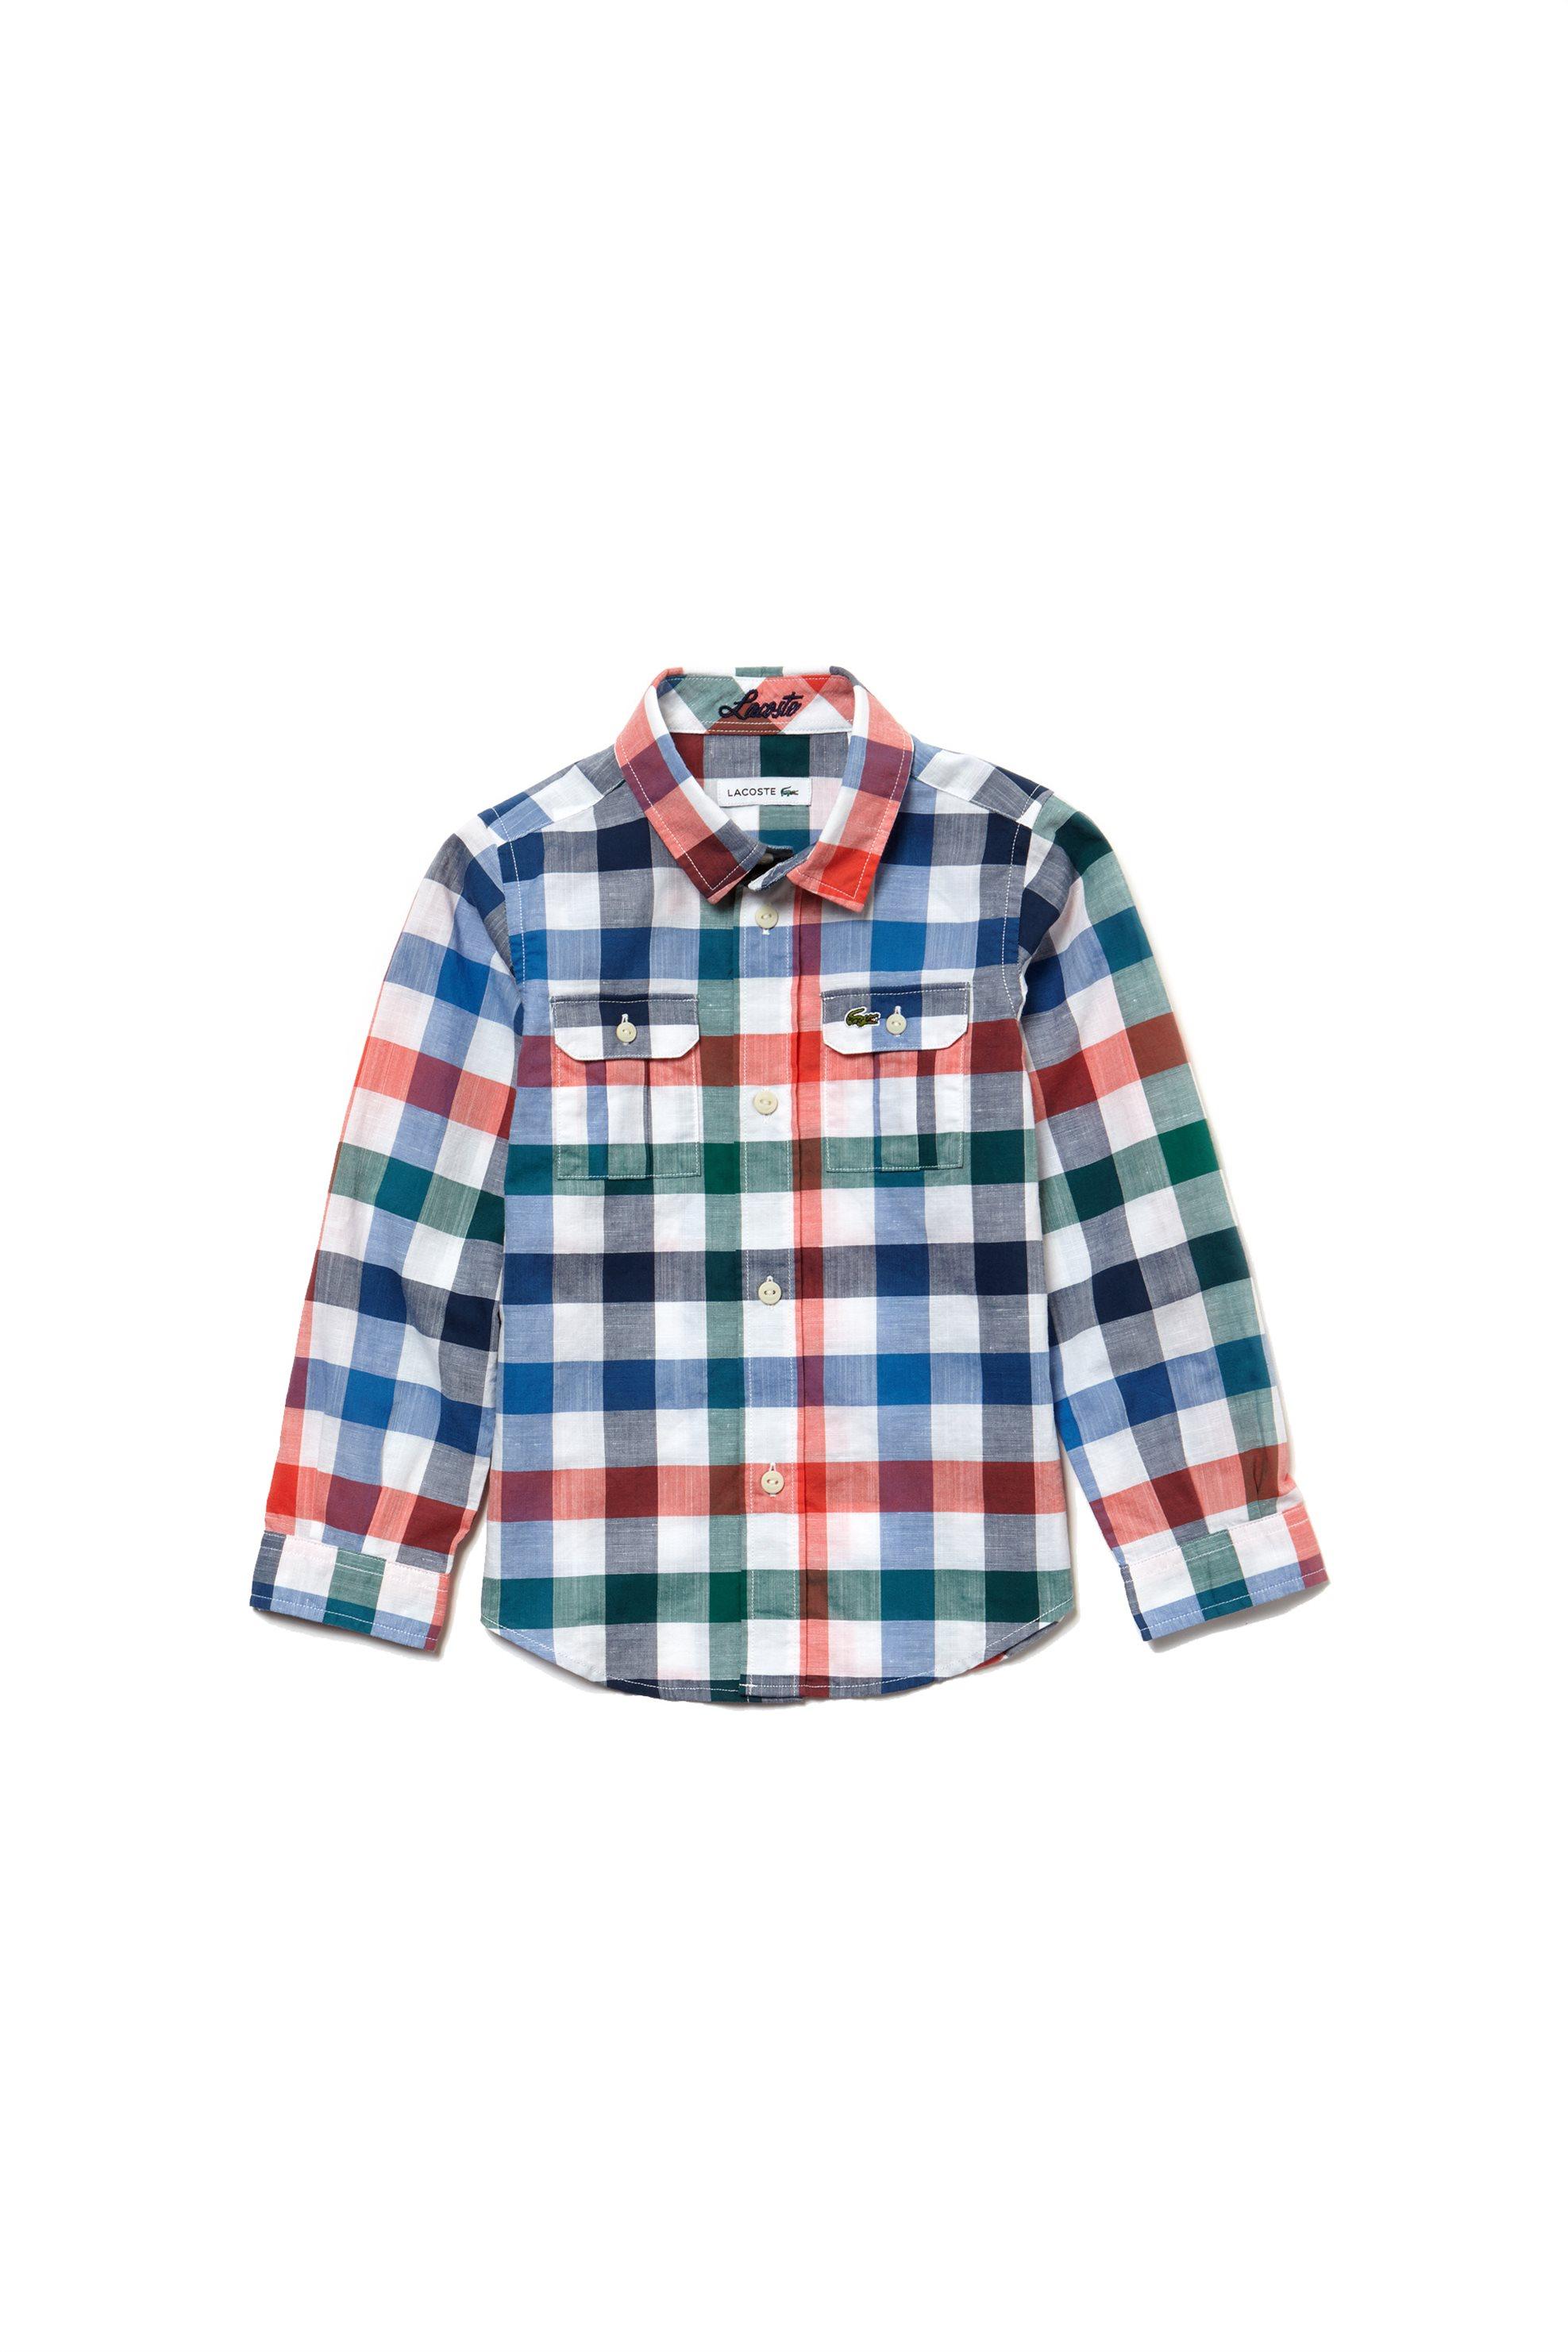 d93cfdf8e12 Notos Παιδικό πουκάμισο καρό S/ S 2018 Kids Collection Lacoste - CJ3874 -  Πολύχρωμο